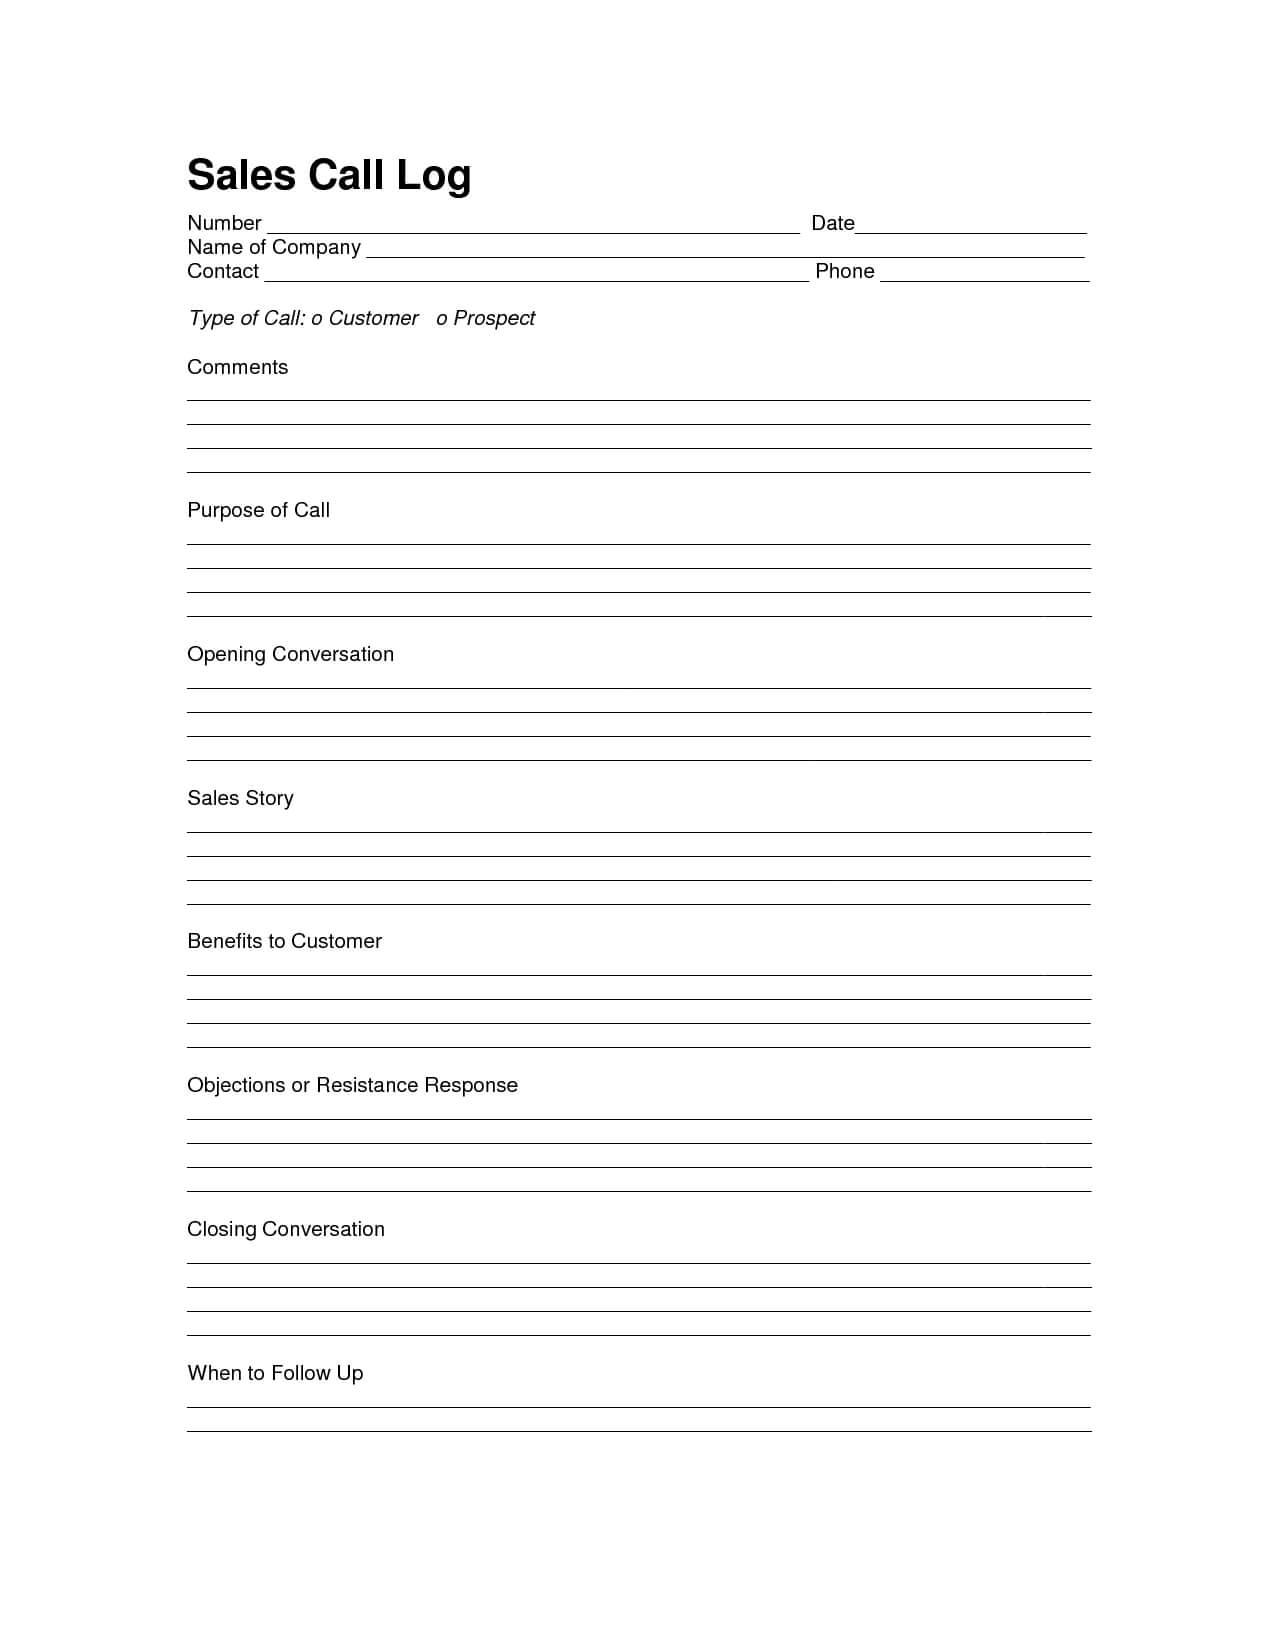 Sales Log Sheet Template | Sales Call Log Template | Sales Intended For Sales Call Report Template Free